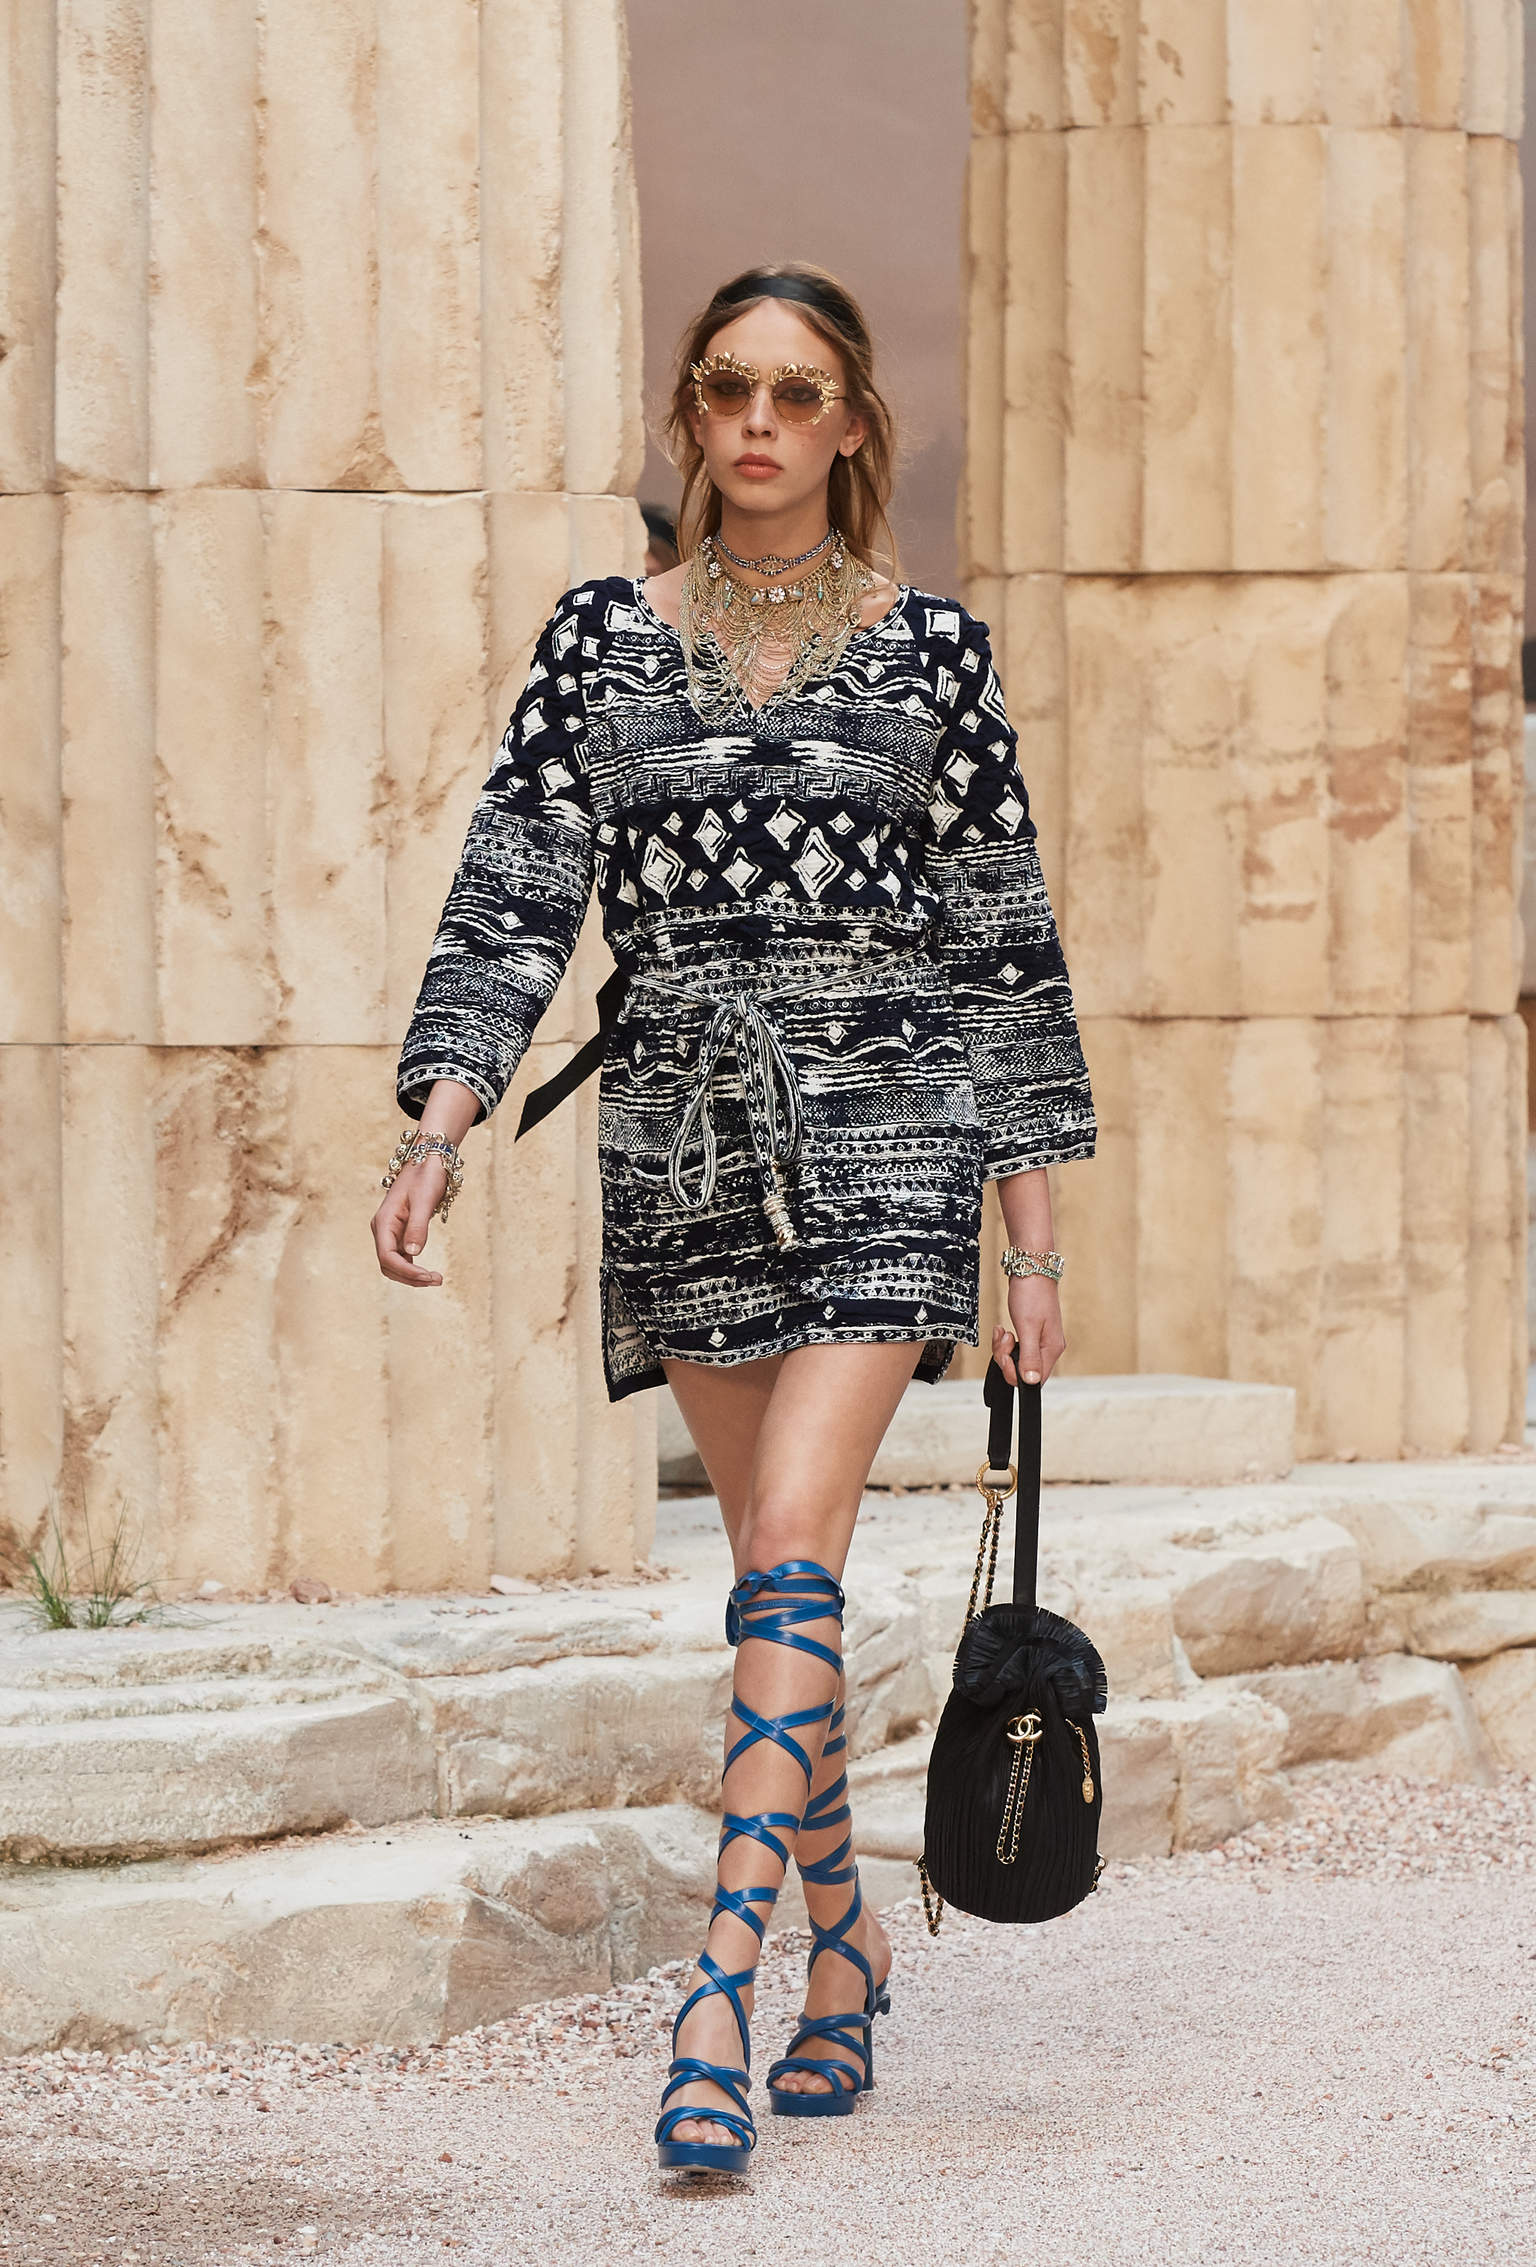 Chanel官網 2018春夏系列 黑色 幻彩折紋小牛皮與金色金屬 雙肩背包